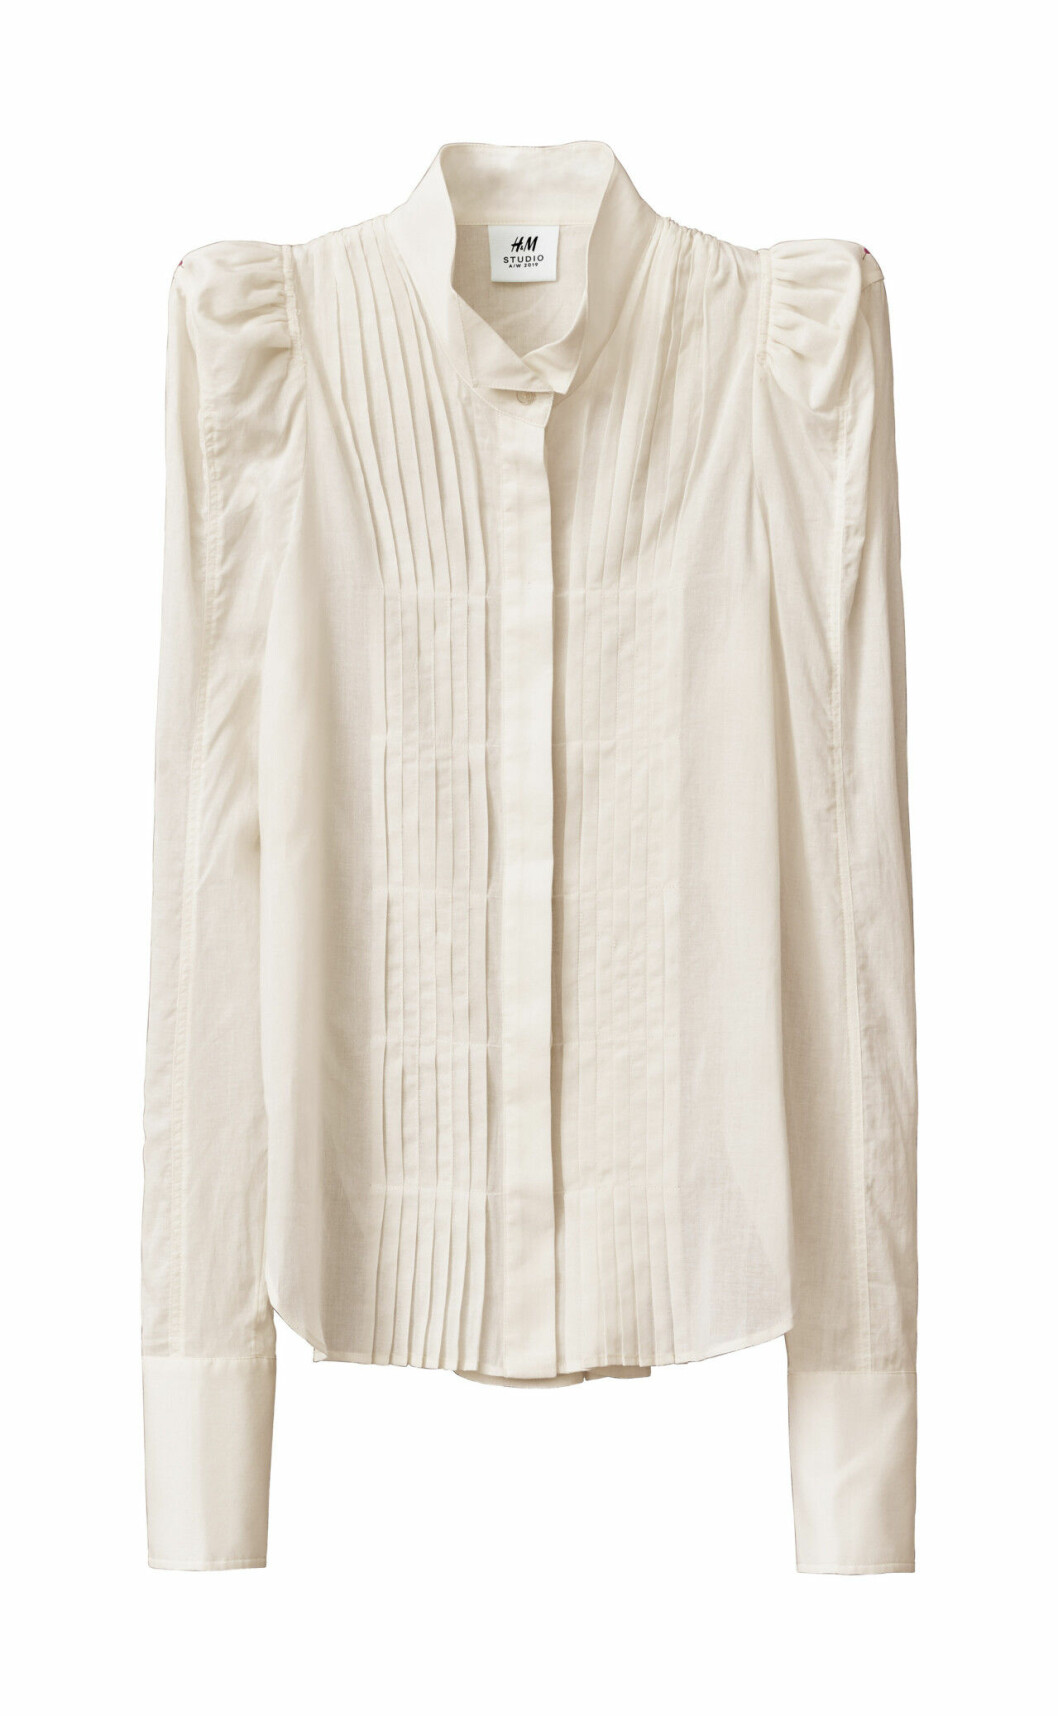 H&M Studio höstkollektion aw 2019 – vit blus med puffärm